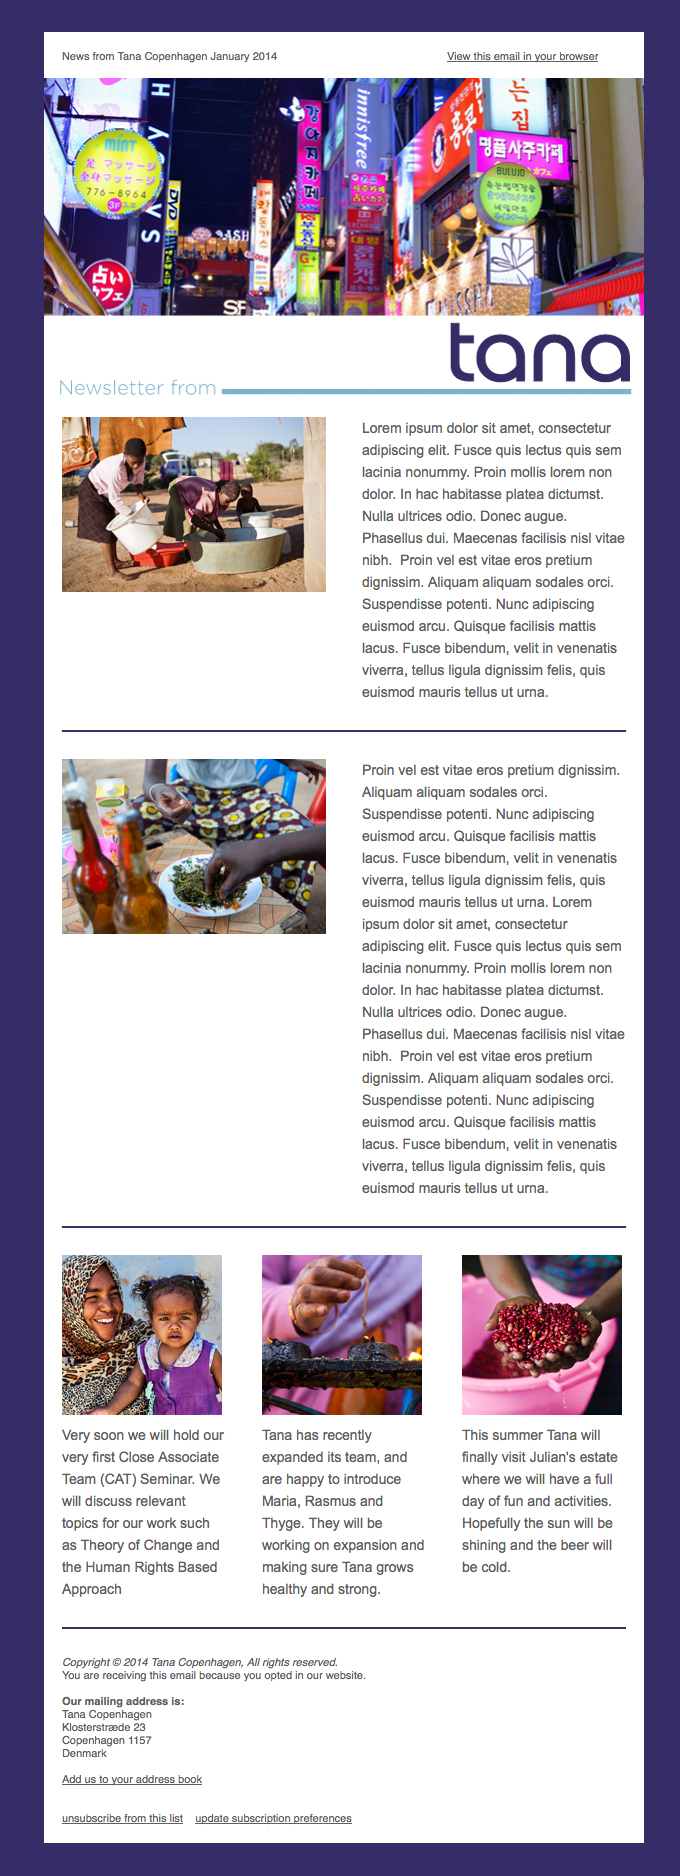 Tana newsletter template